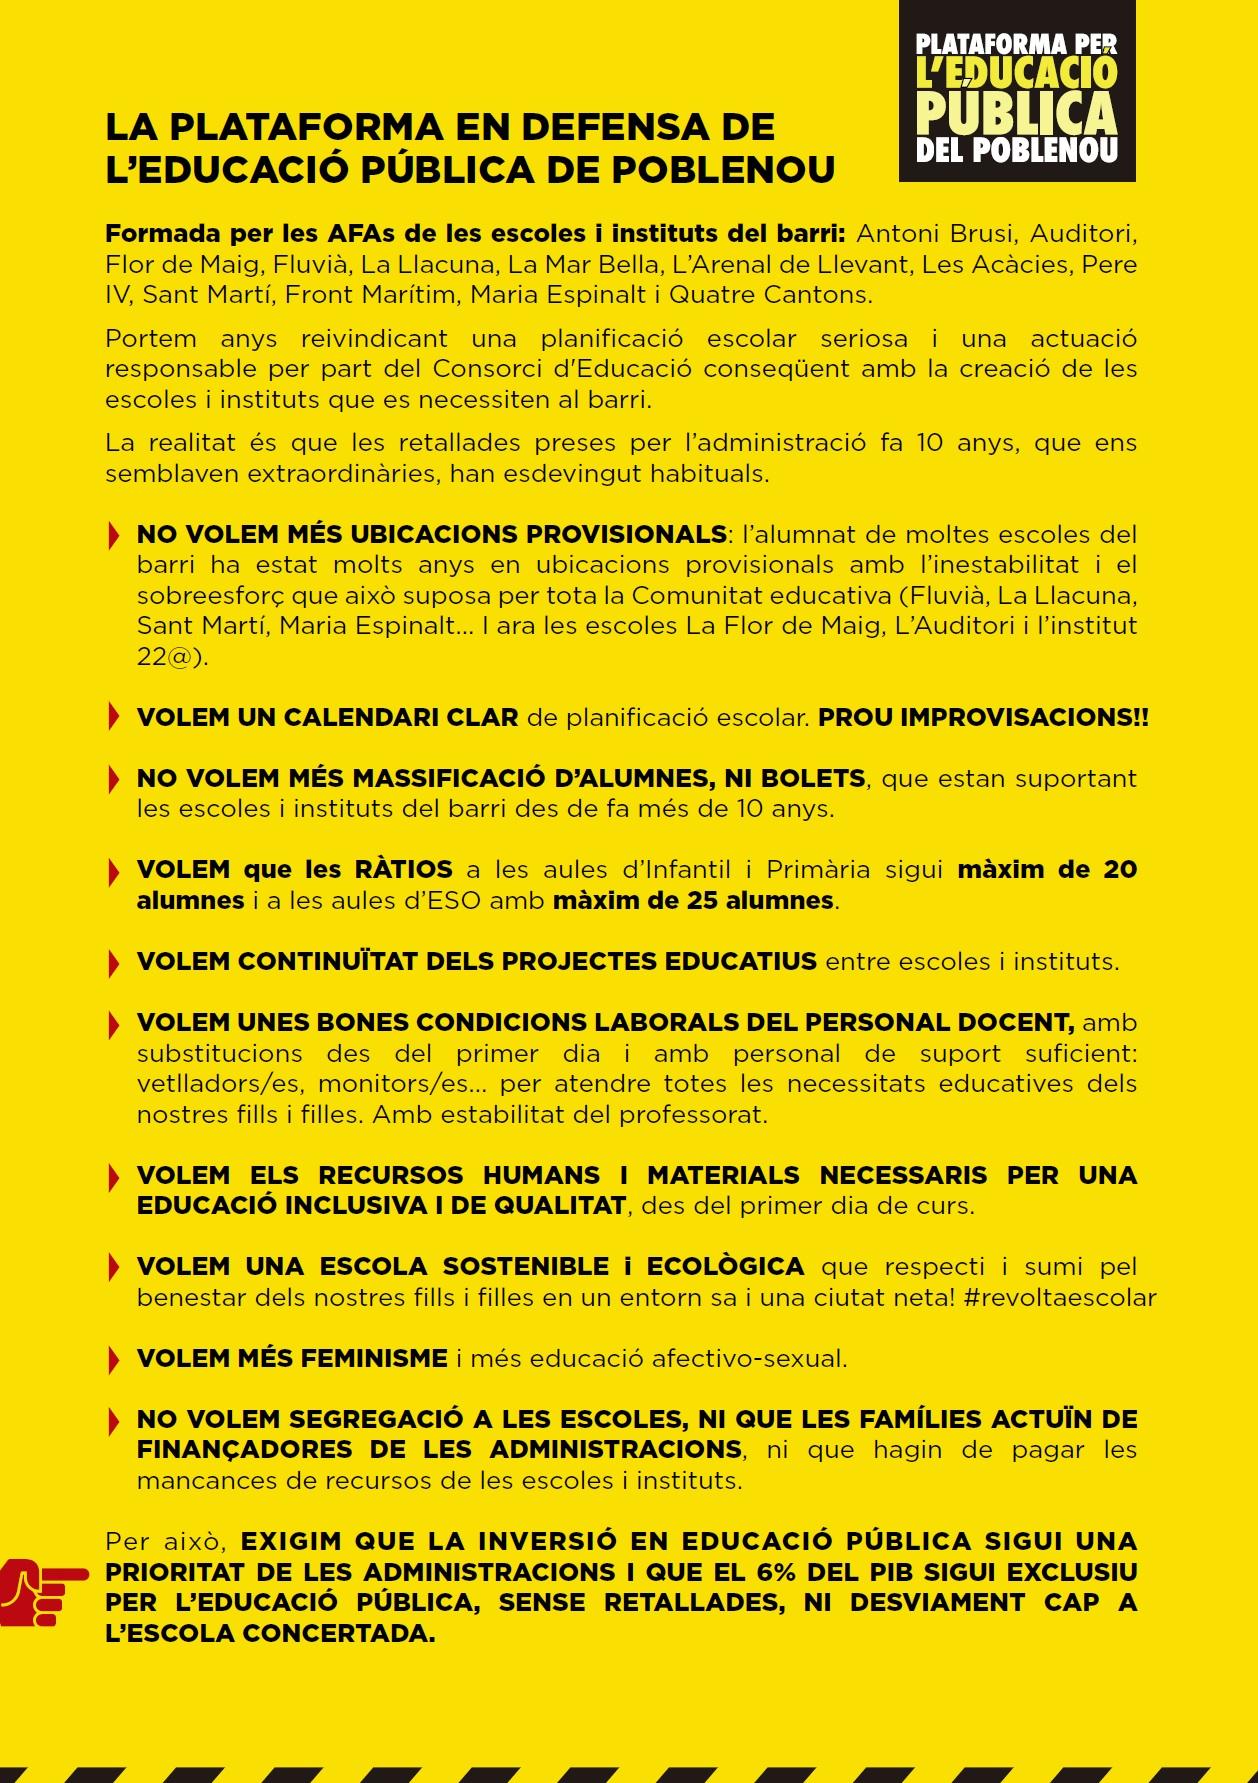 Manifest de la Plataforma-2021